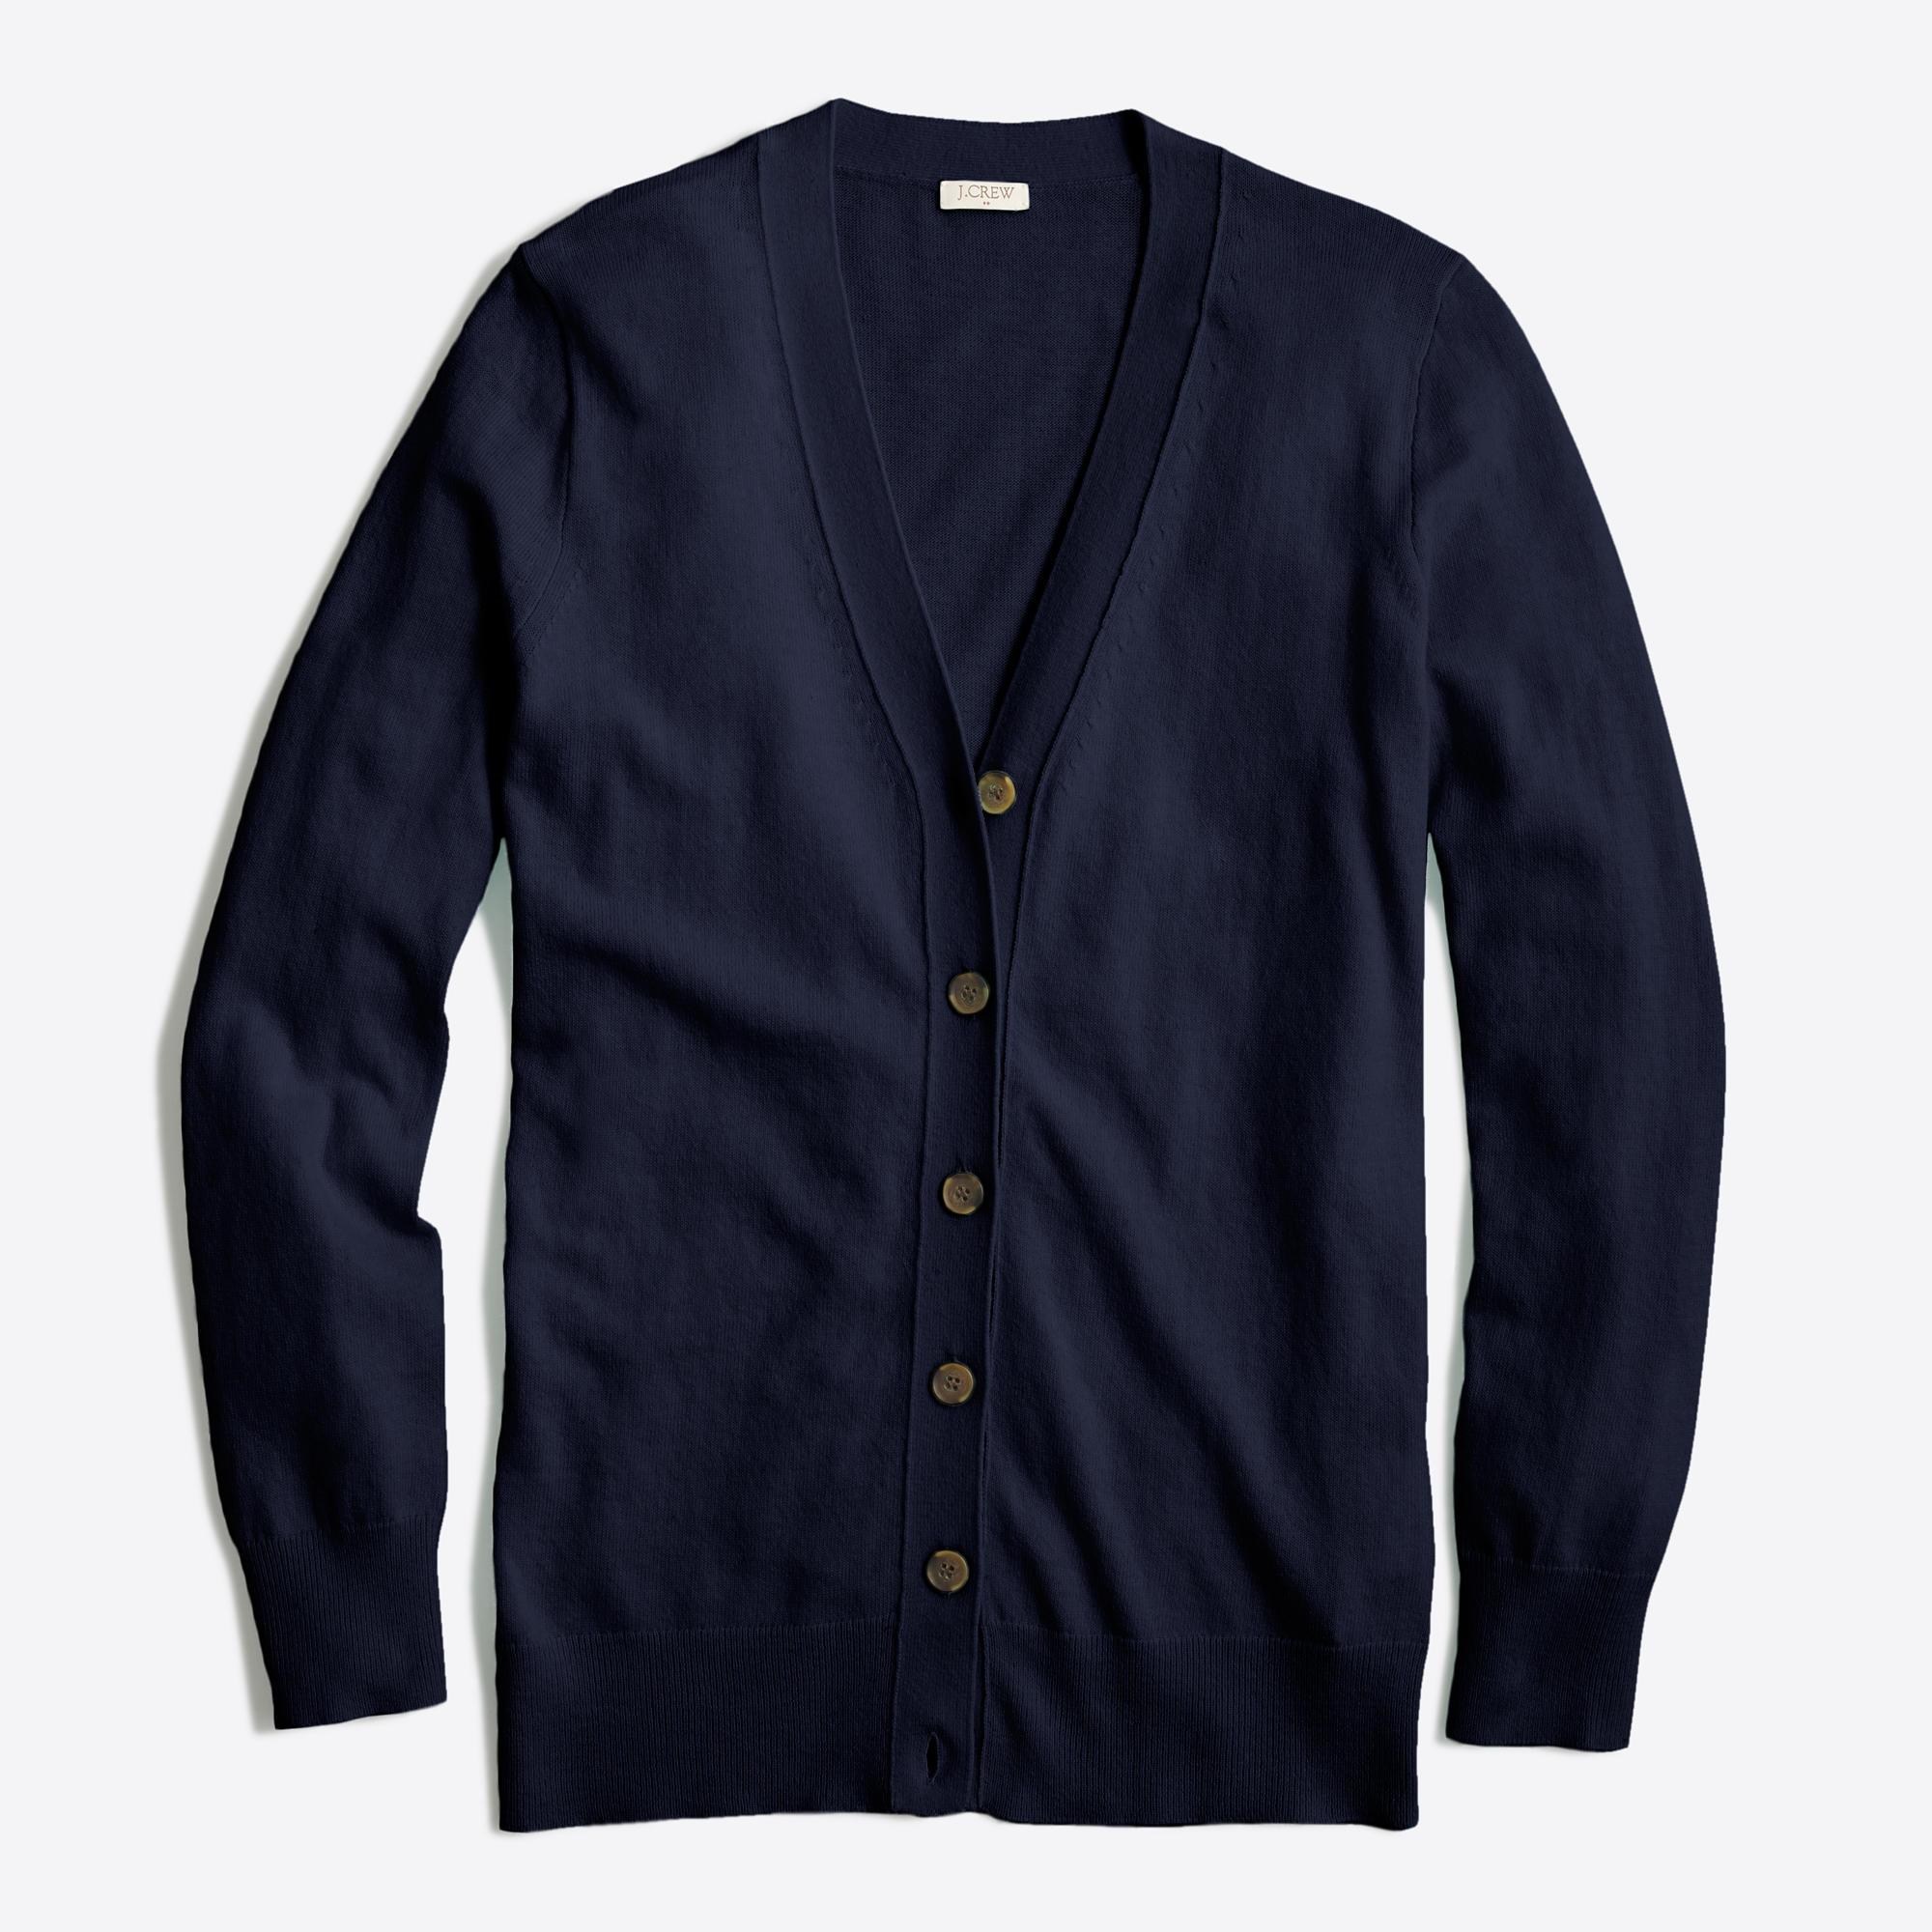 V-neck cardigan sweater : FactoryWomen cardigans & shells | Factory